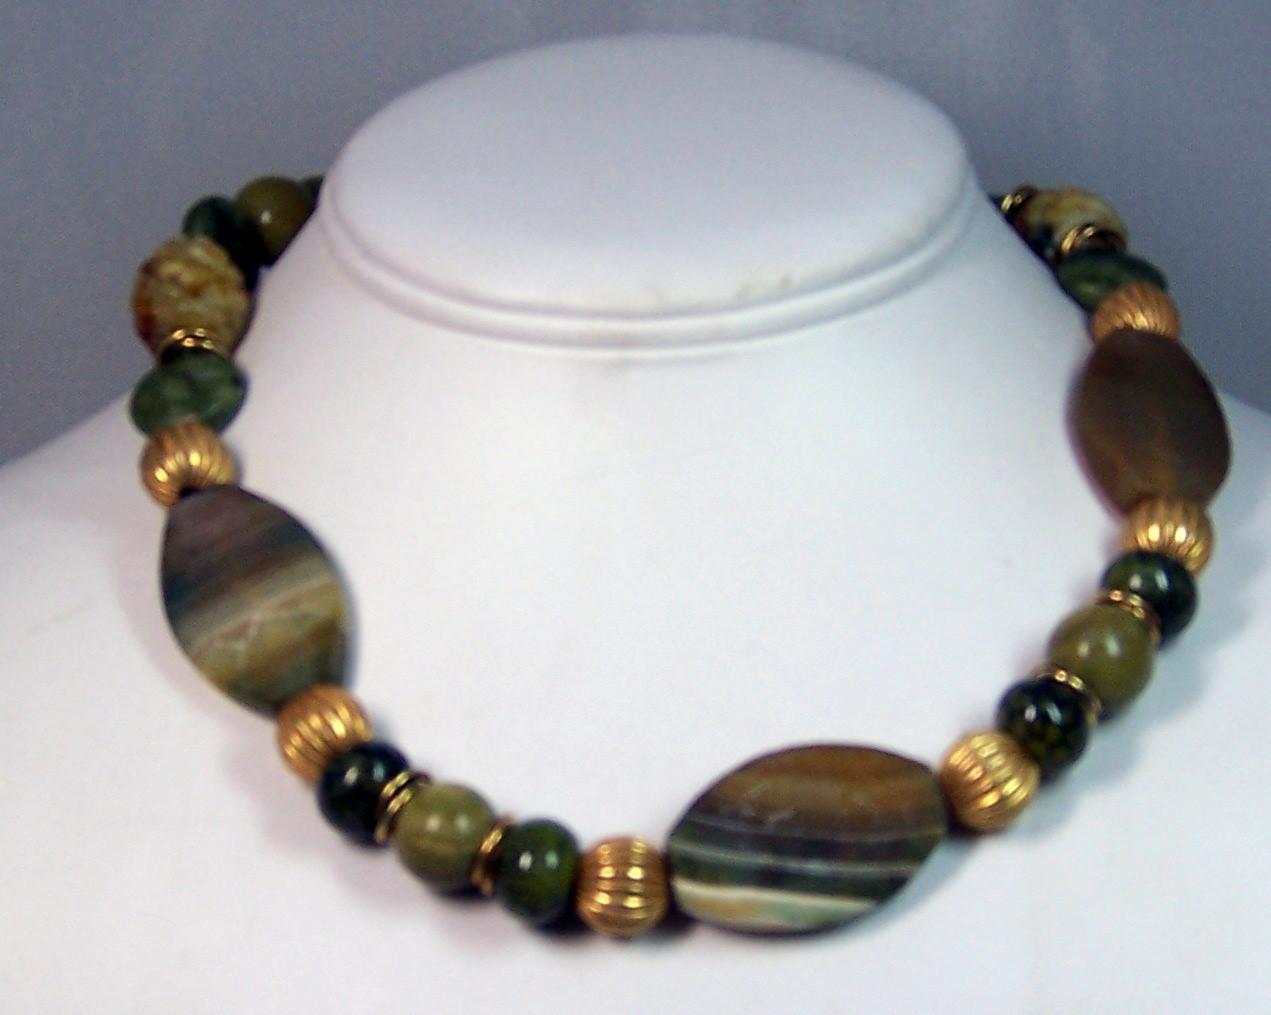 Jasper, jade & agate necklace